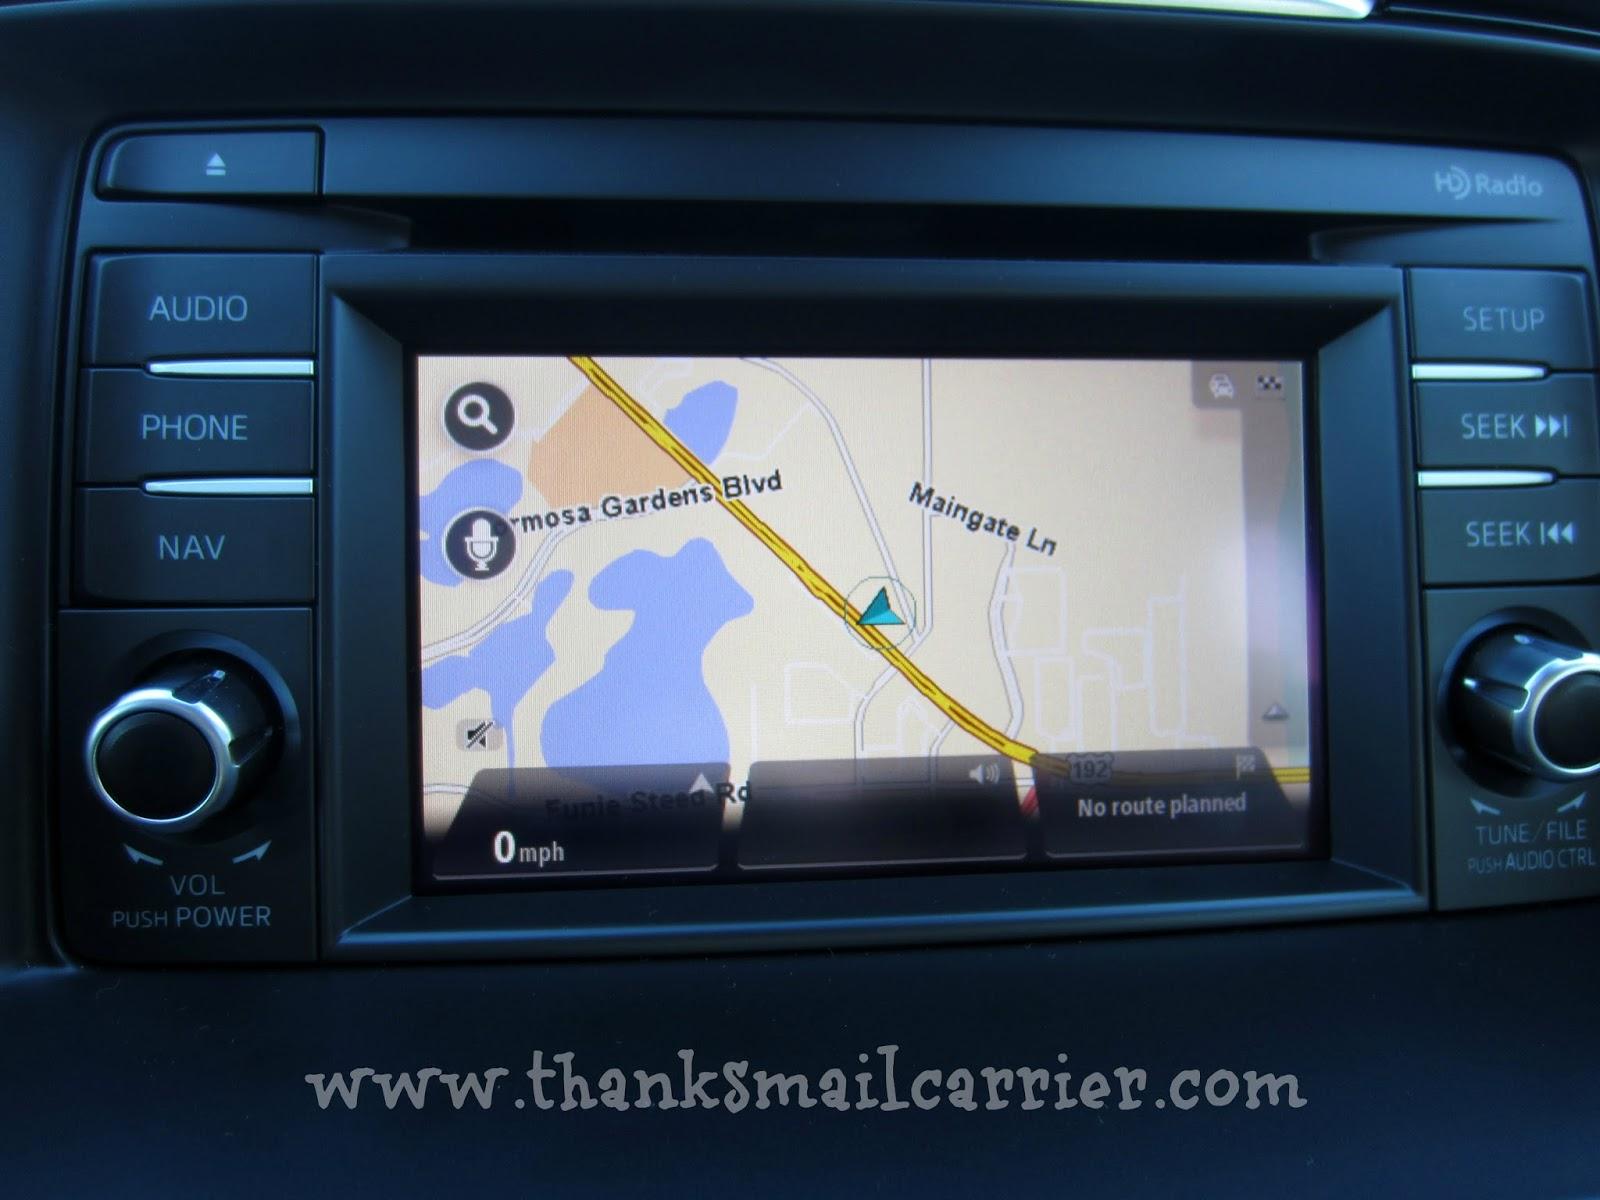 Mazda navigation system